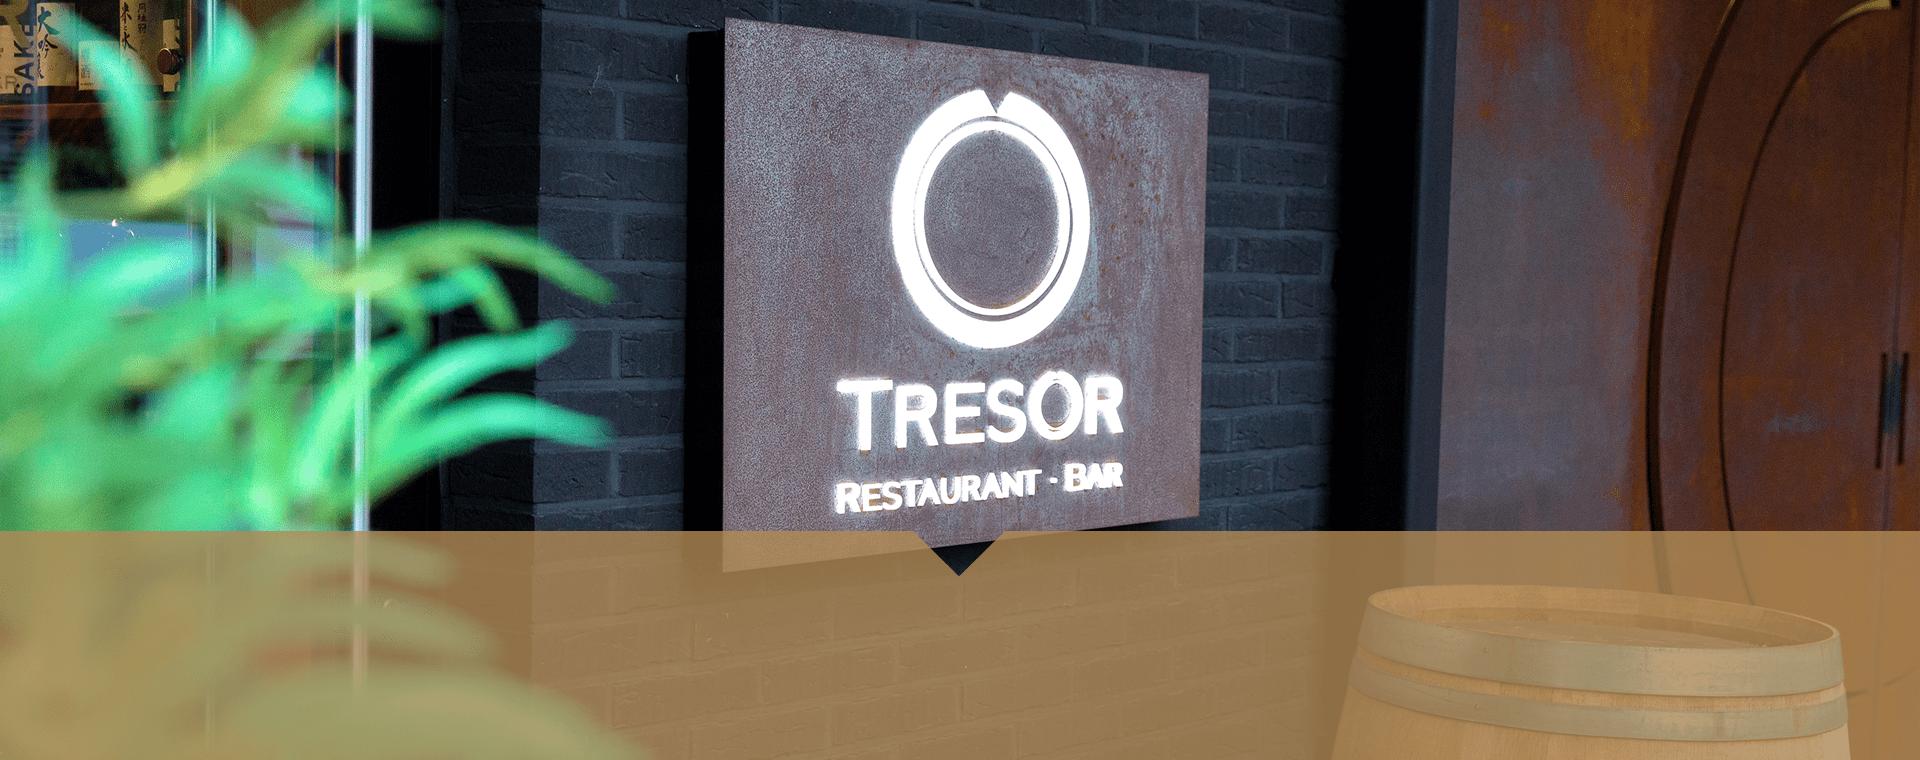 Titebild TresOr Desktop